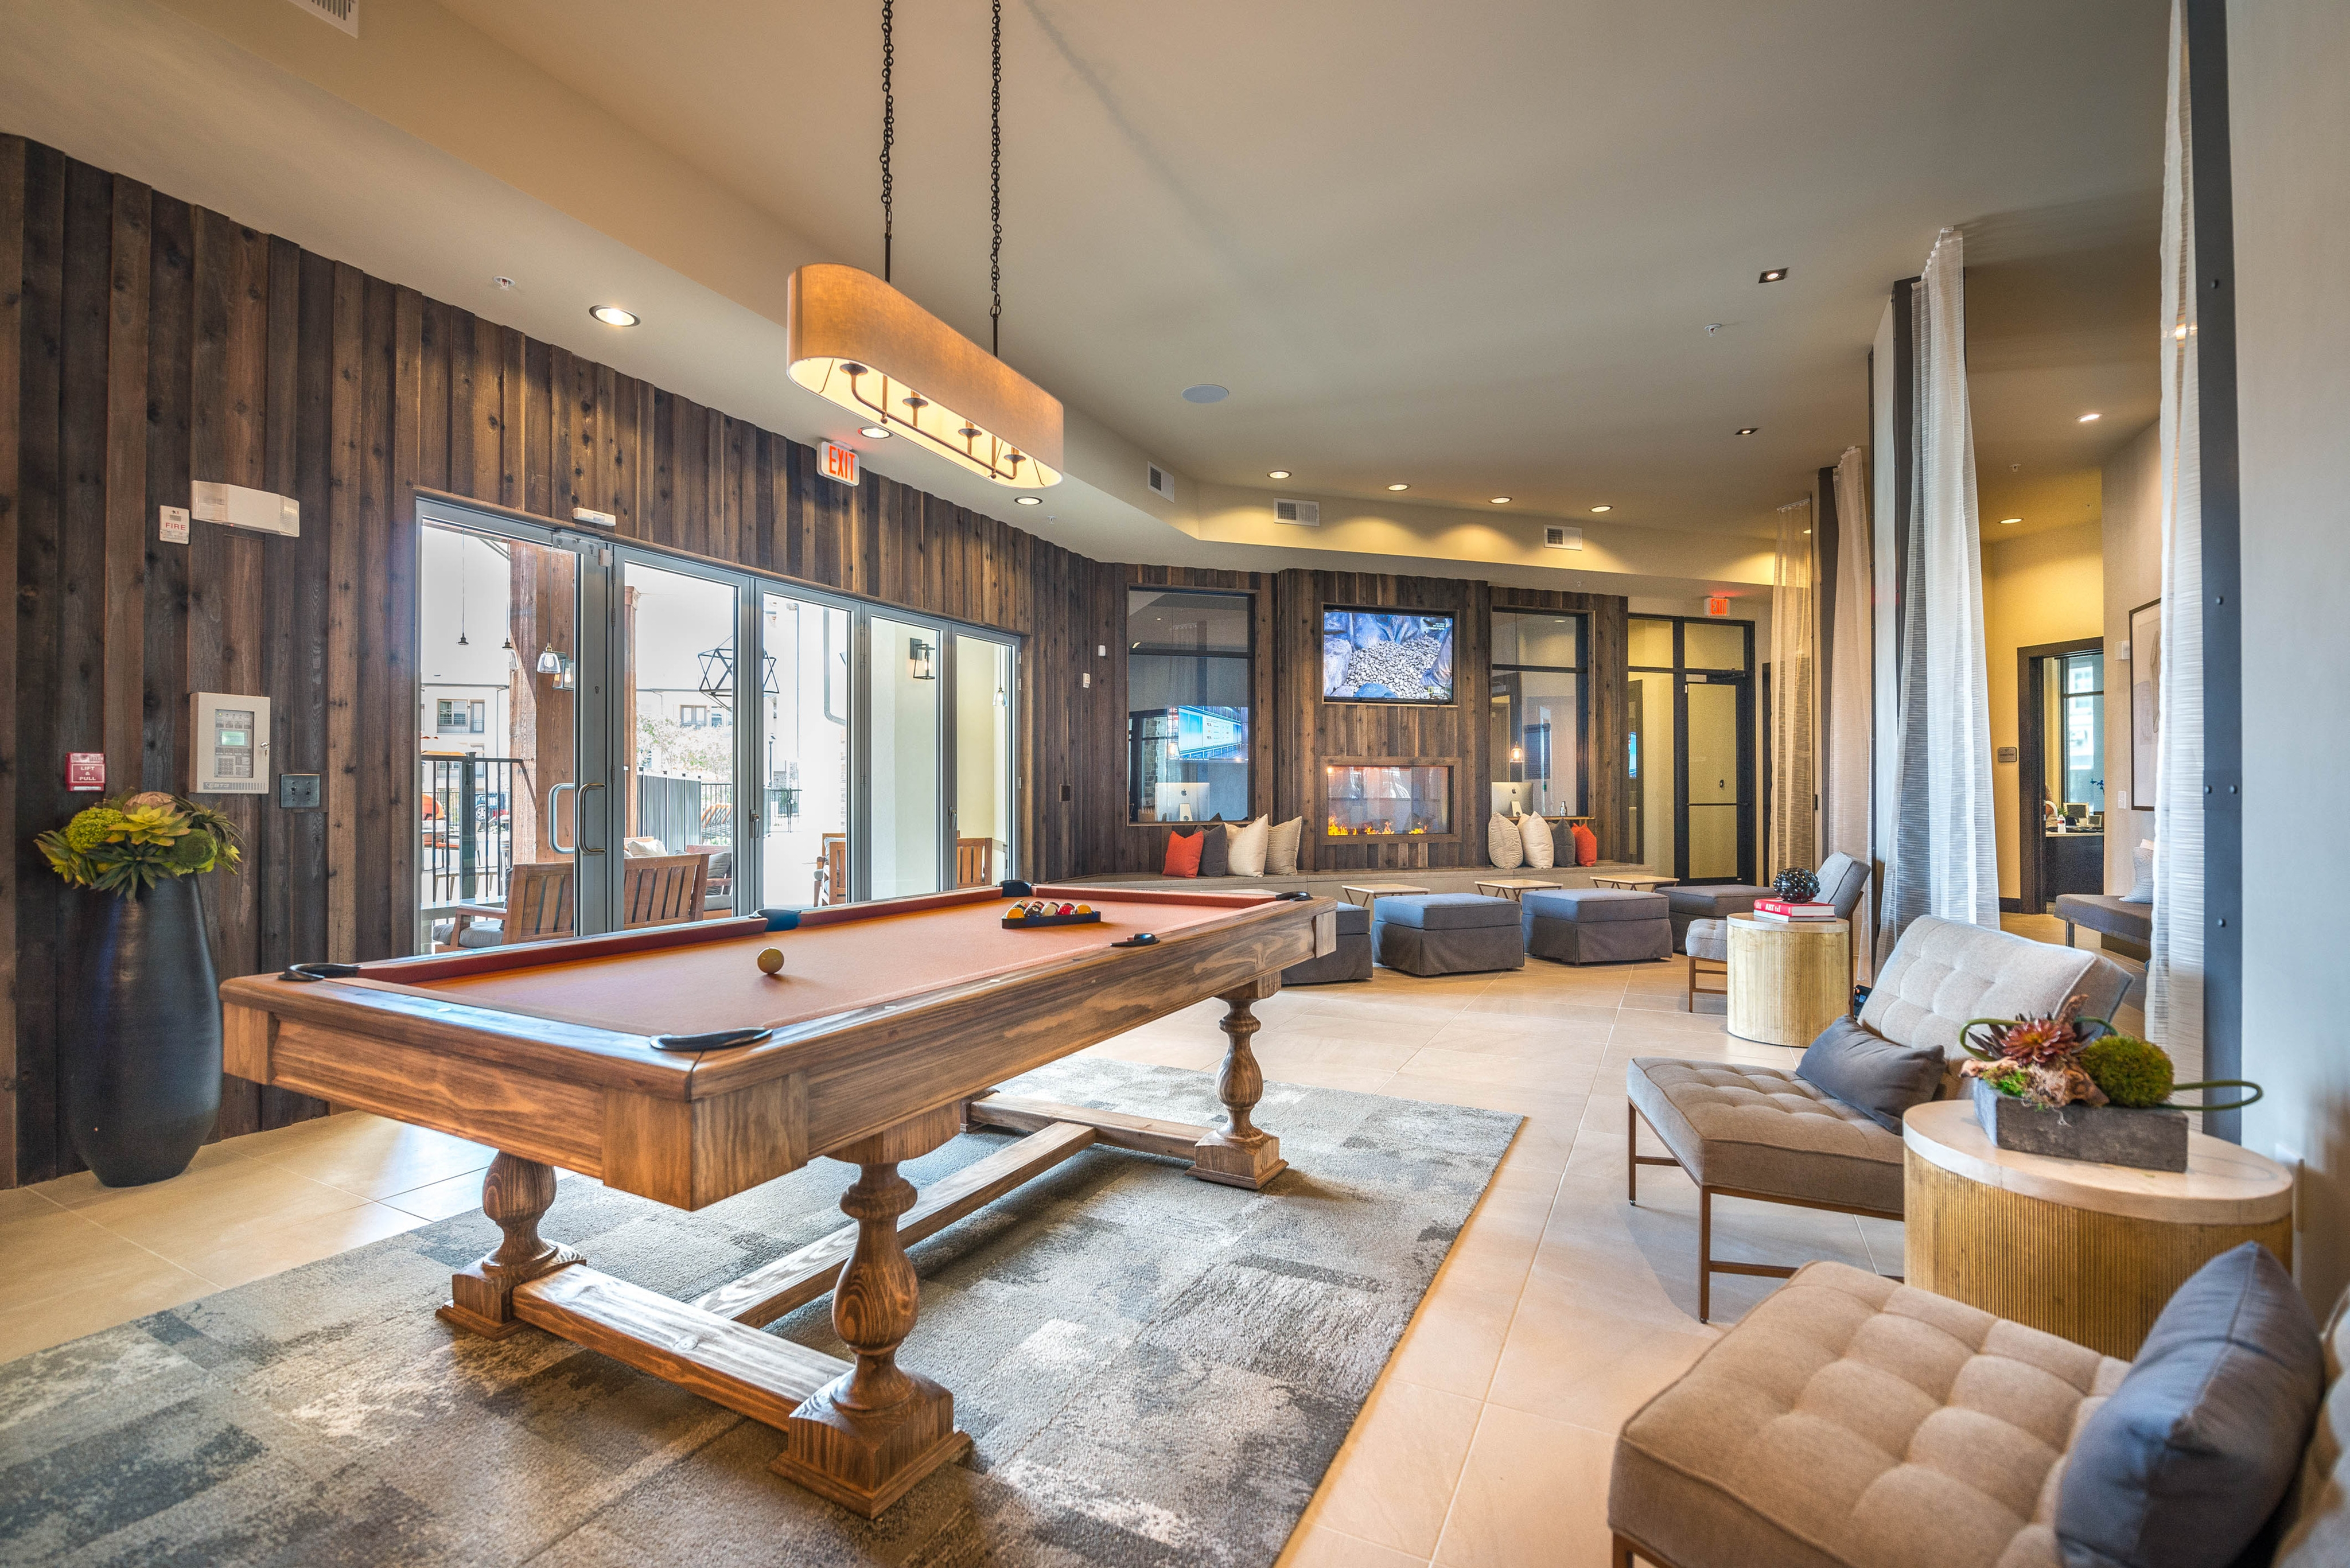 game-room-elan-dallas-murphys-corporate-lodging